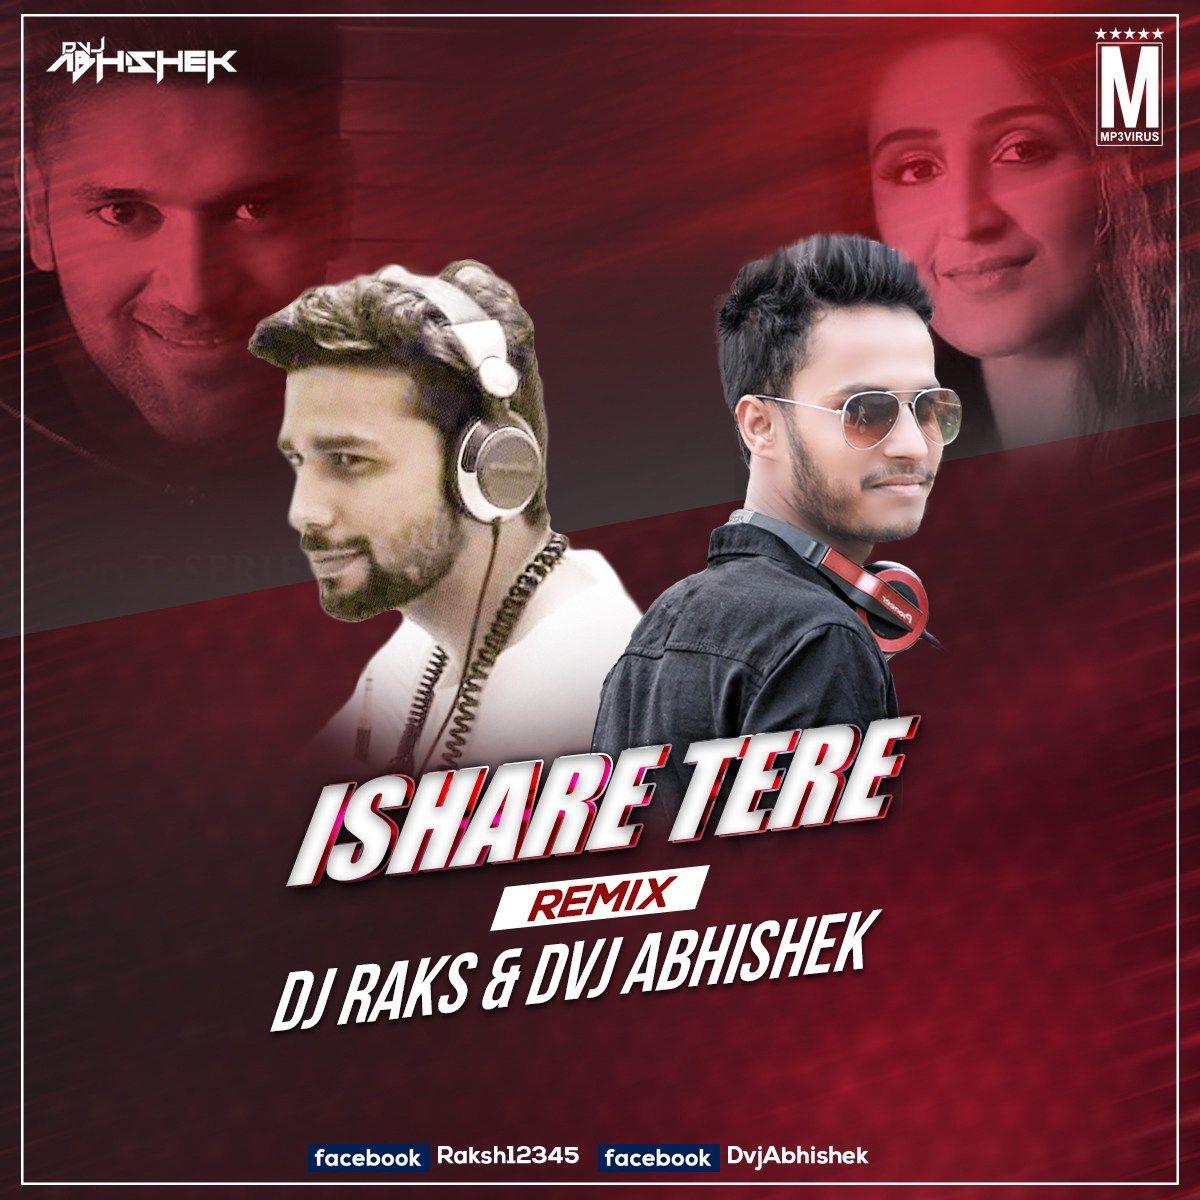 Ishare Tere Remix Dvj Abhishek Dj Raks Download Now Remix Dj Songs Songs